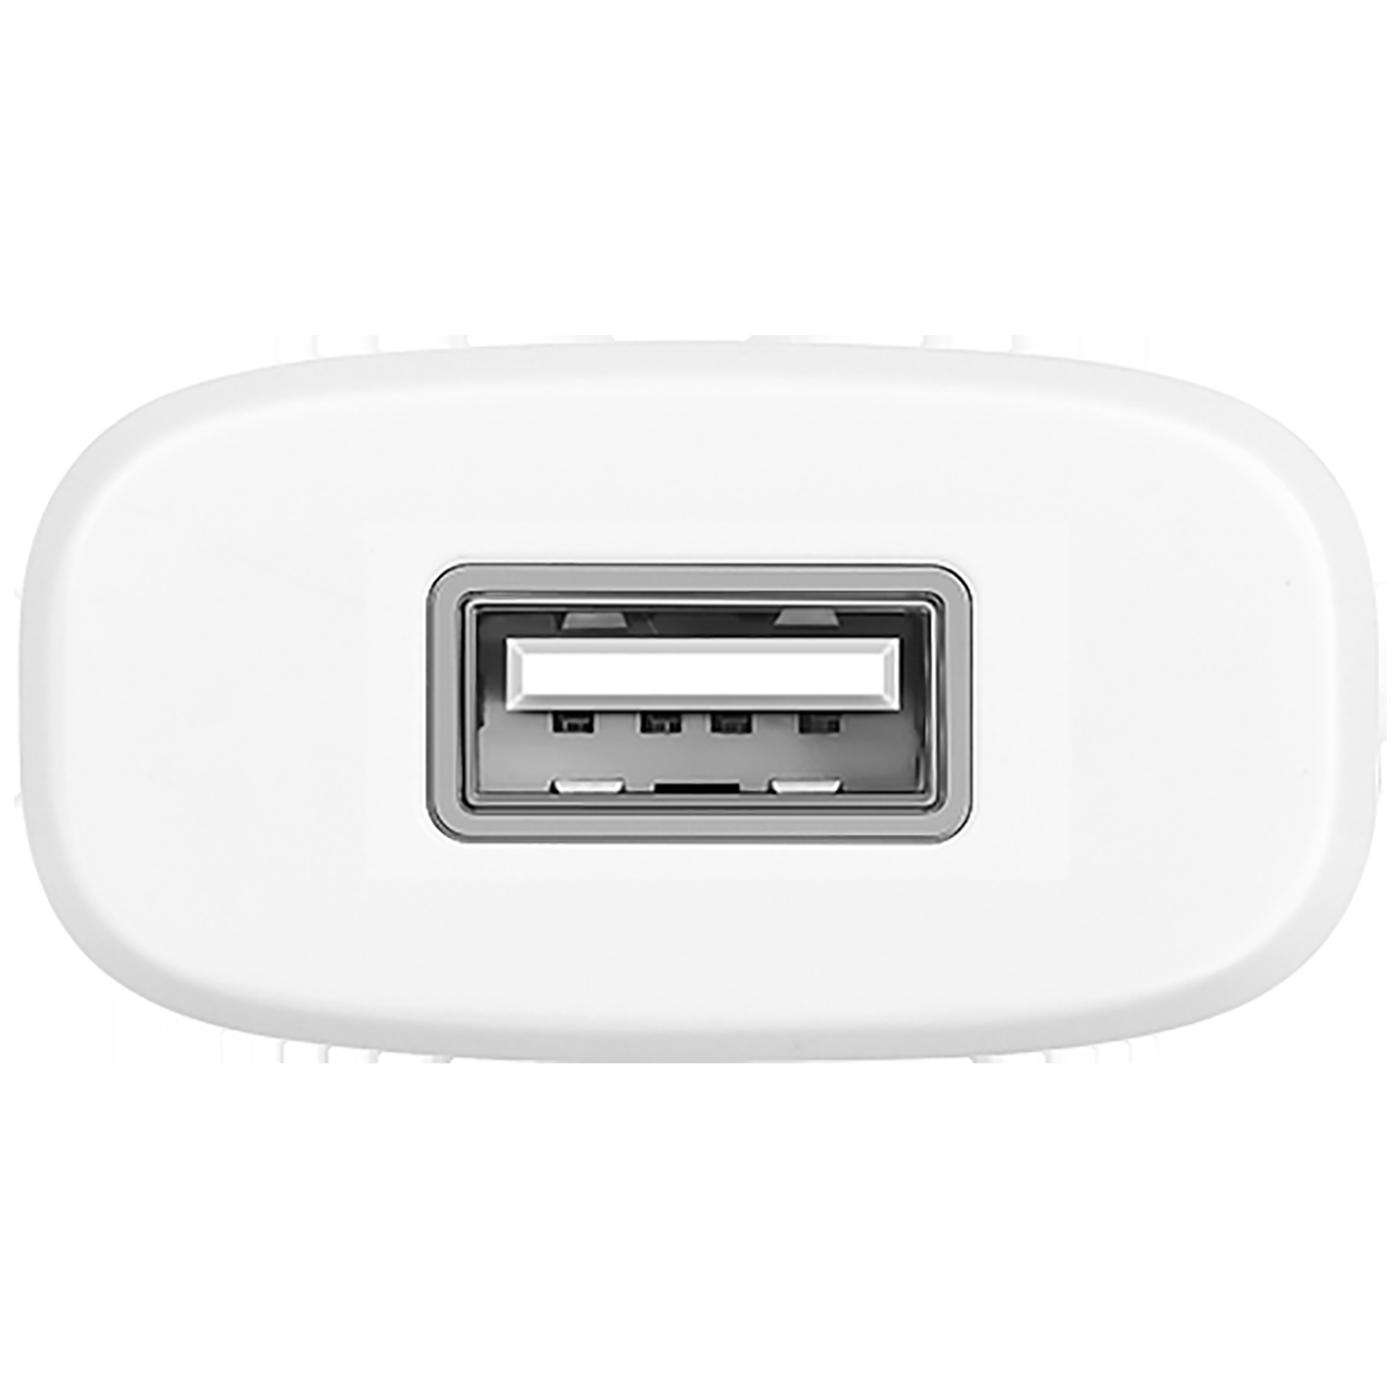 C11 Smart single USB, micro USB